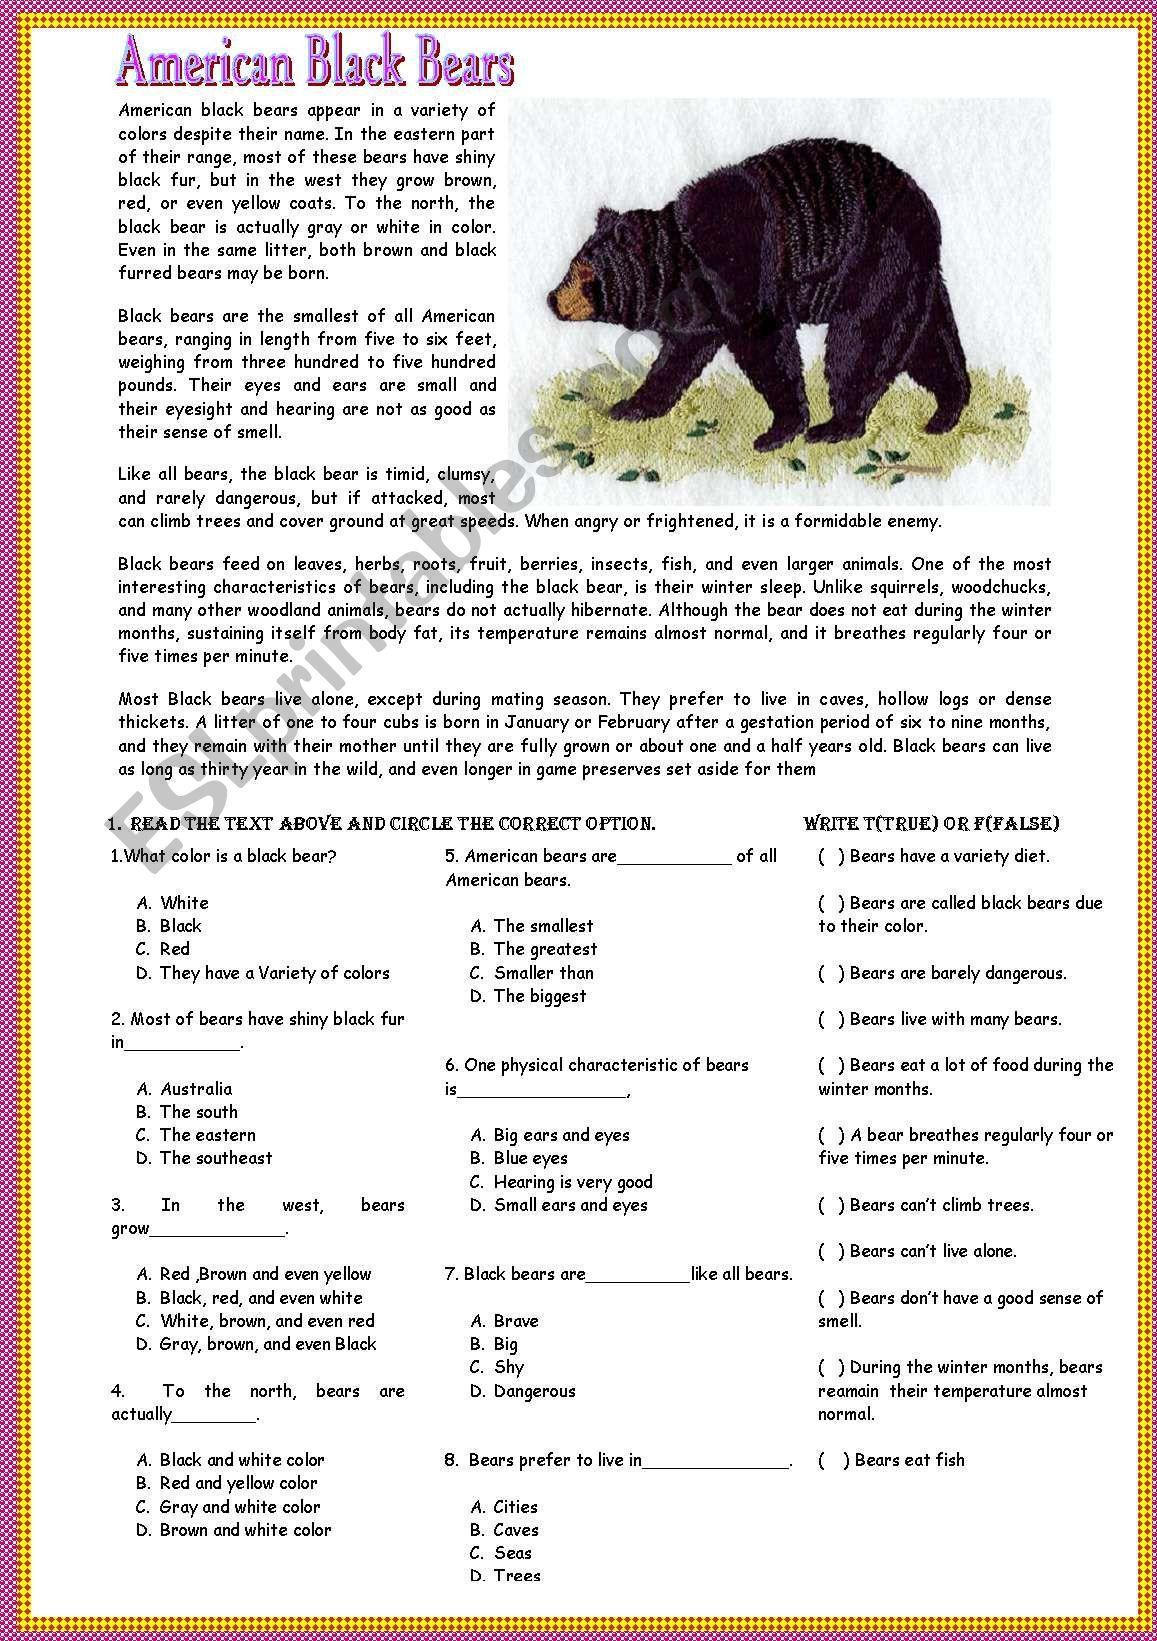 Reading American Black Bears